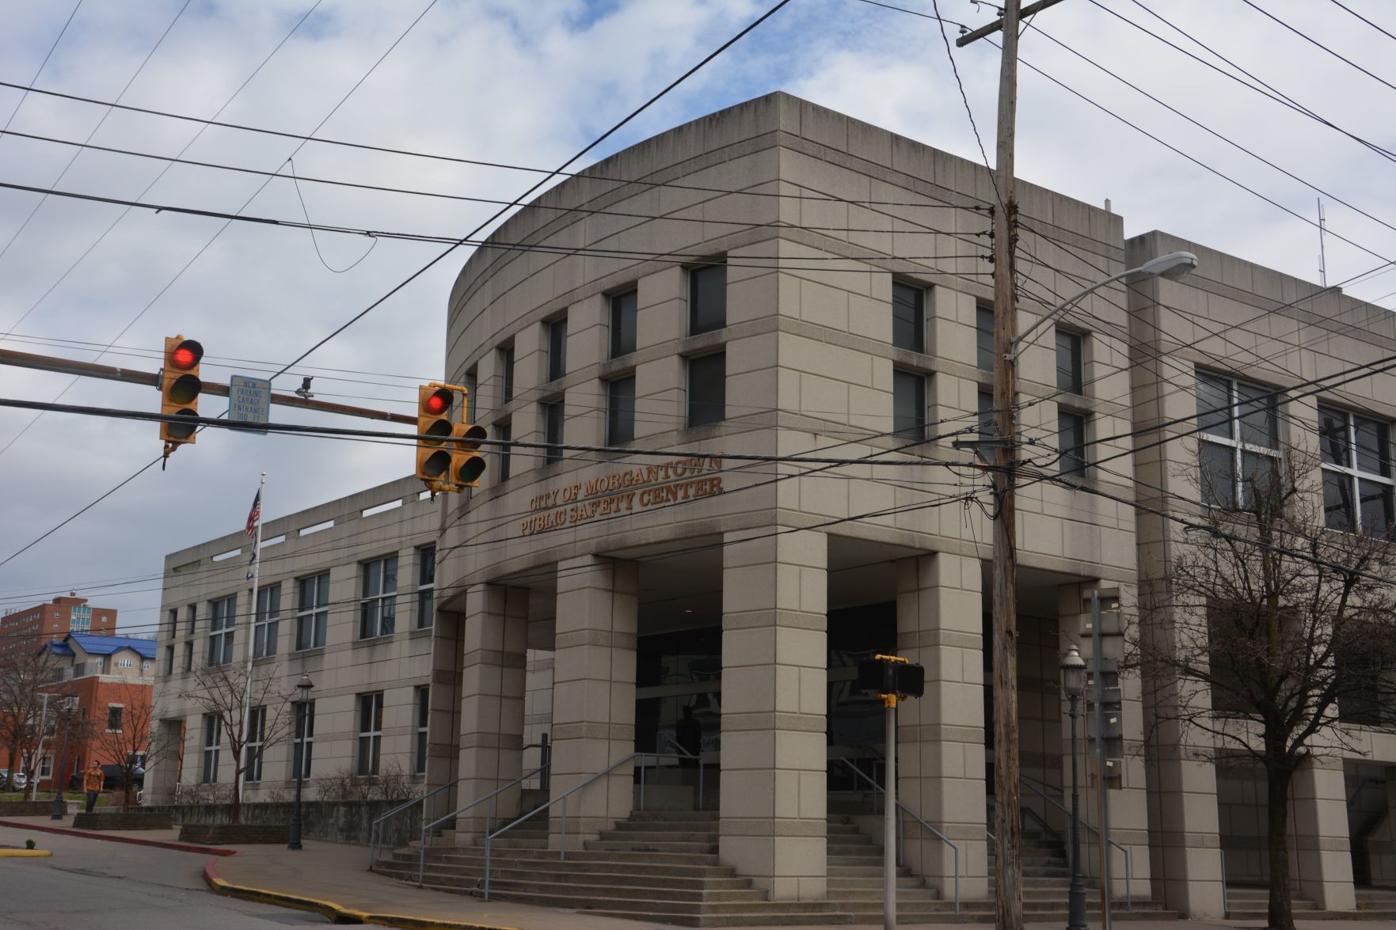 Morgantown Police HQ